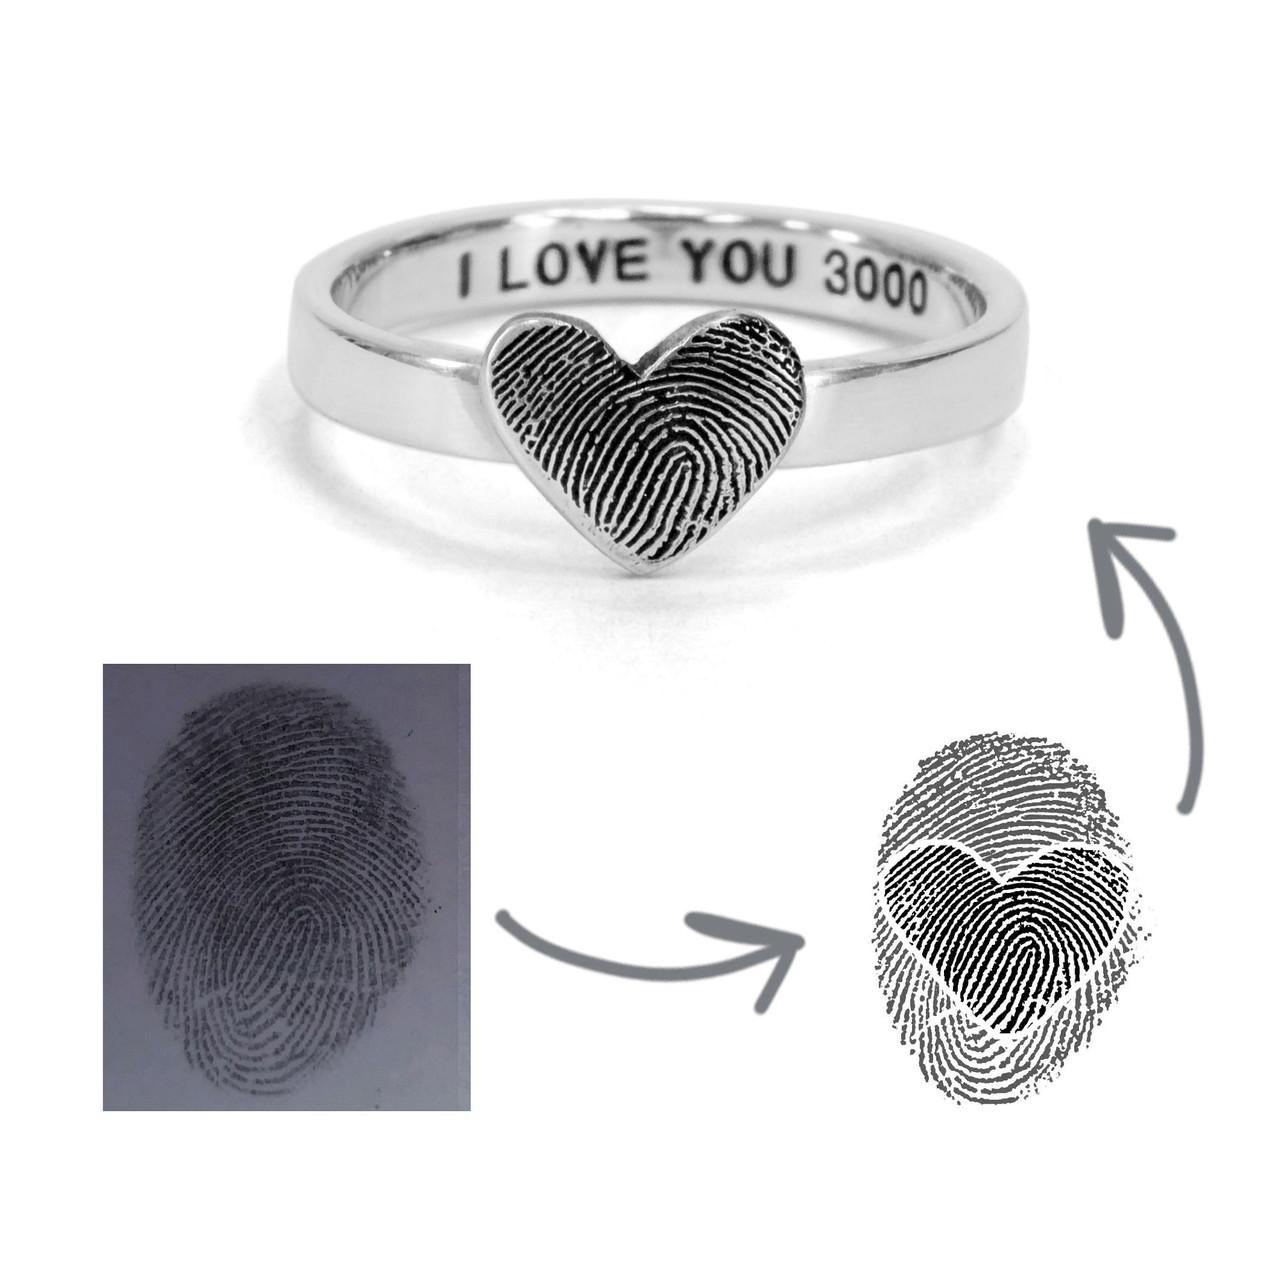 custom heart shaped fingerprint jewelry ring in sterling silver, shown on with original fingerprint